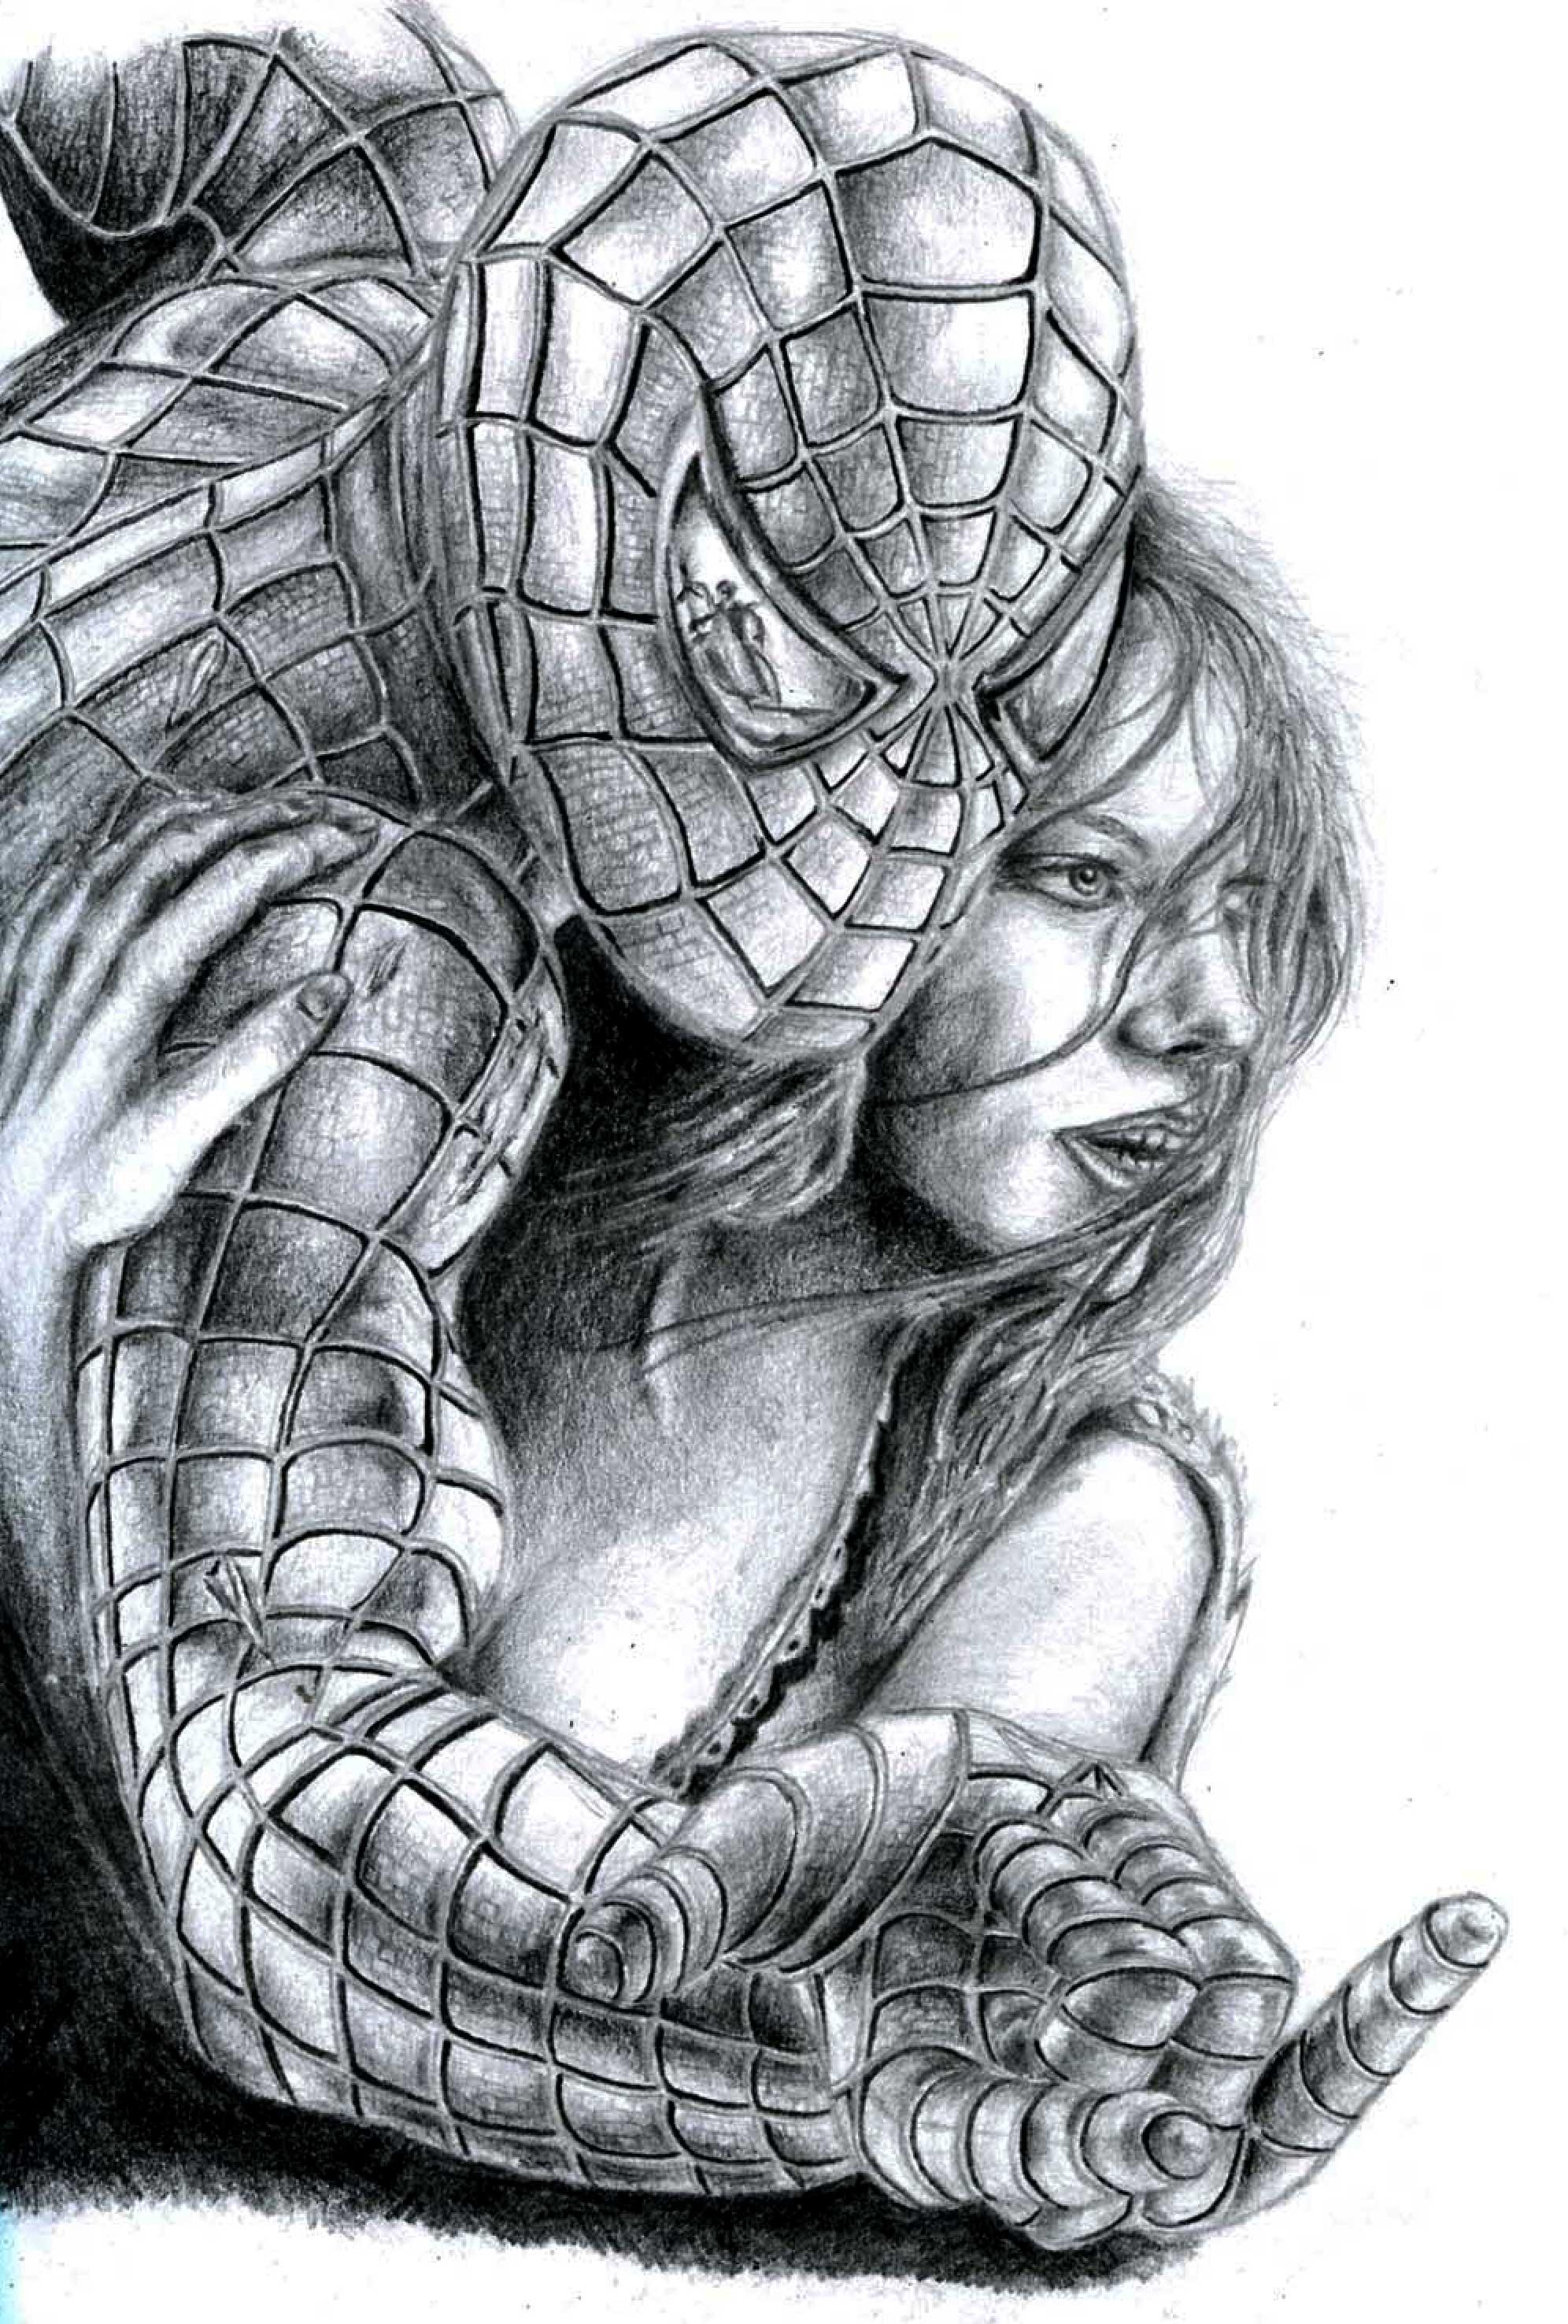 Drawn pencil spider Pencil Drawings Design Pencil Drawings